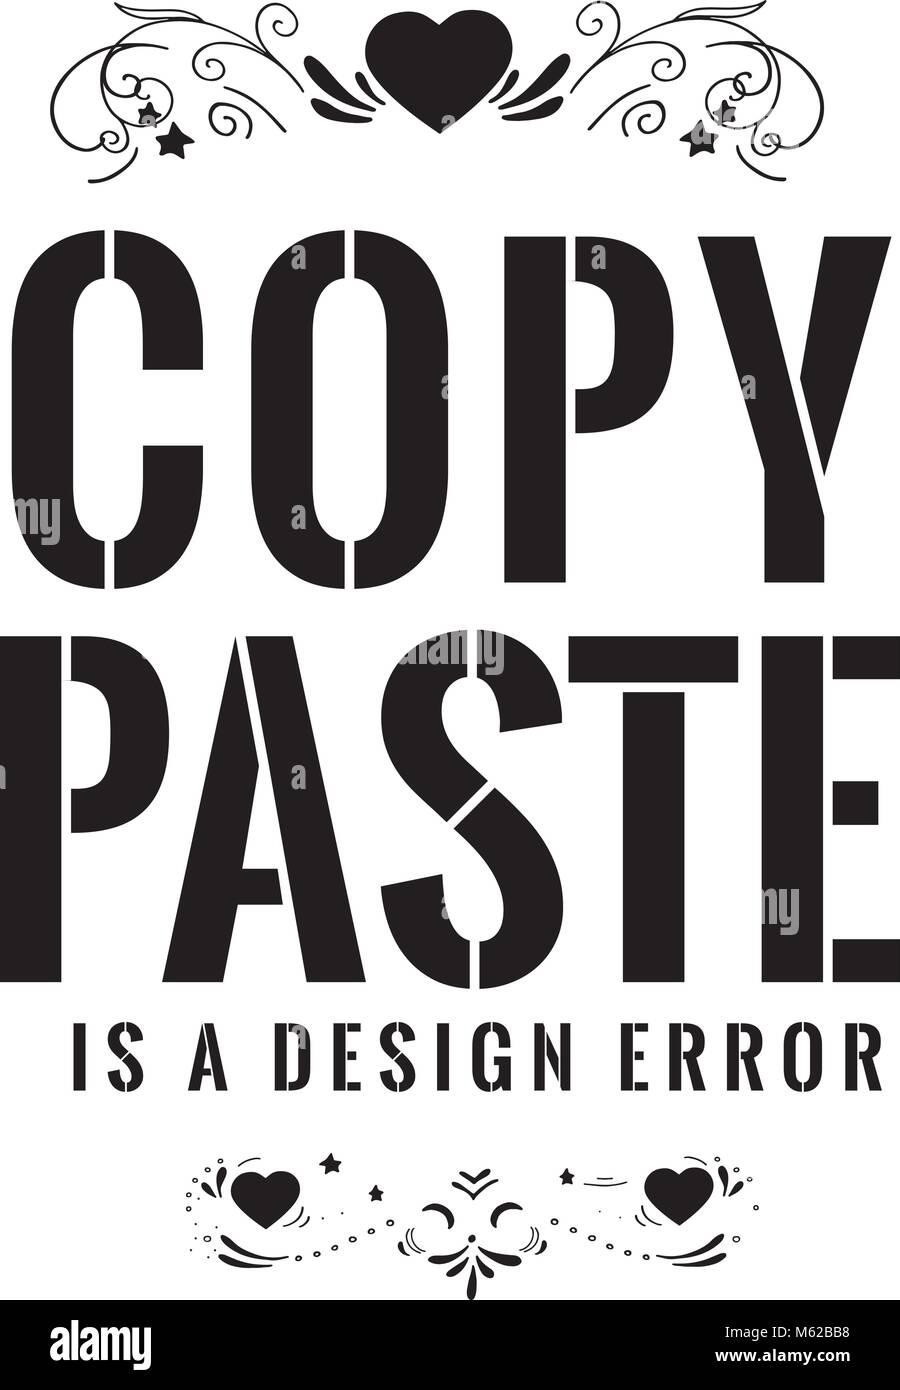 copy paste is a design error - Stock Image